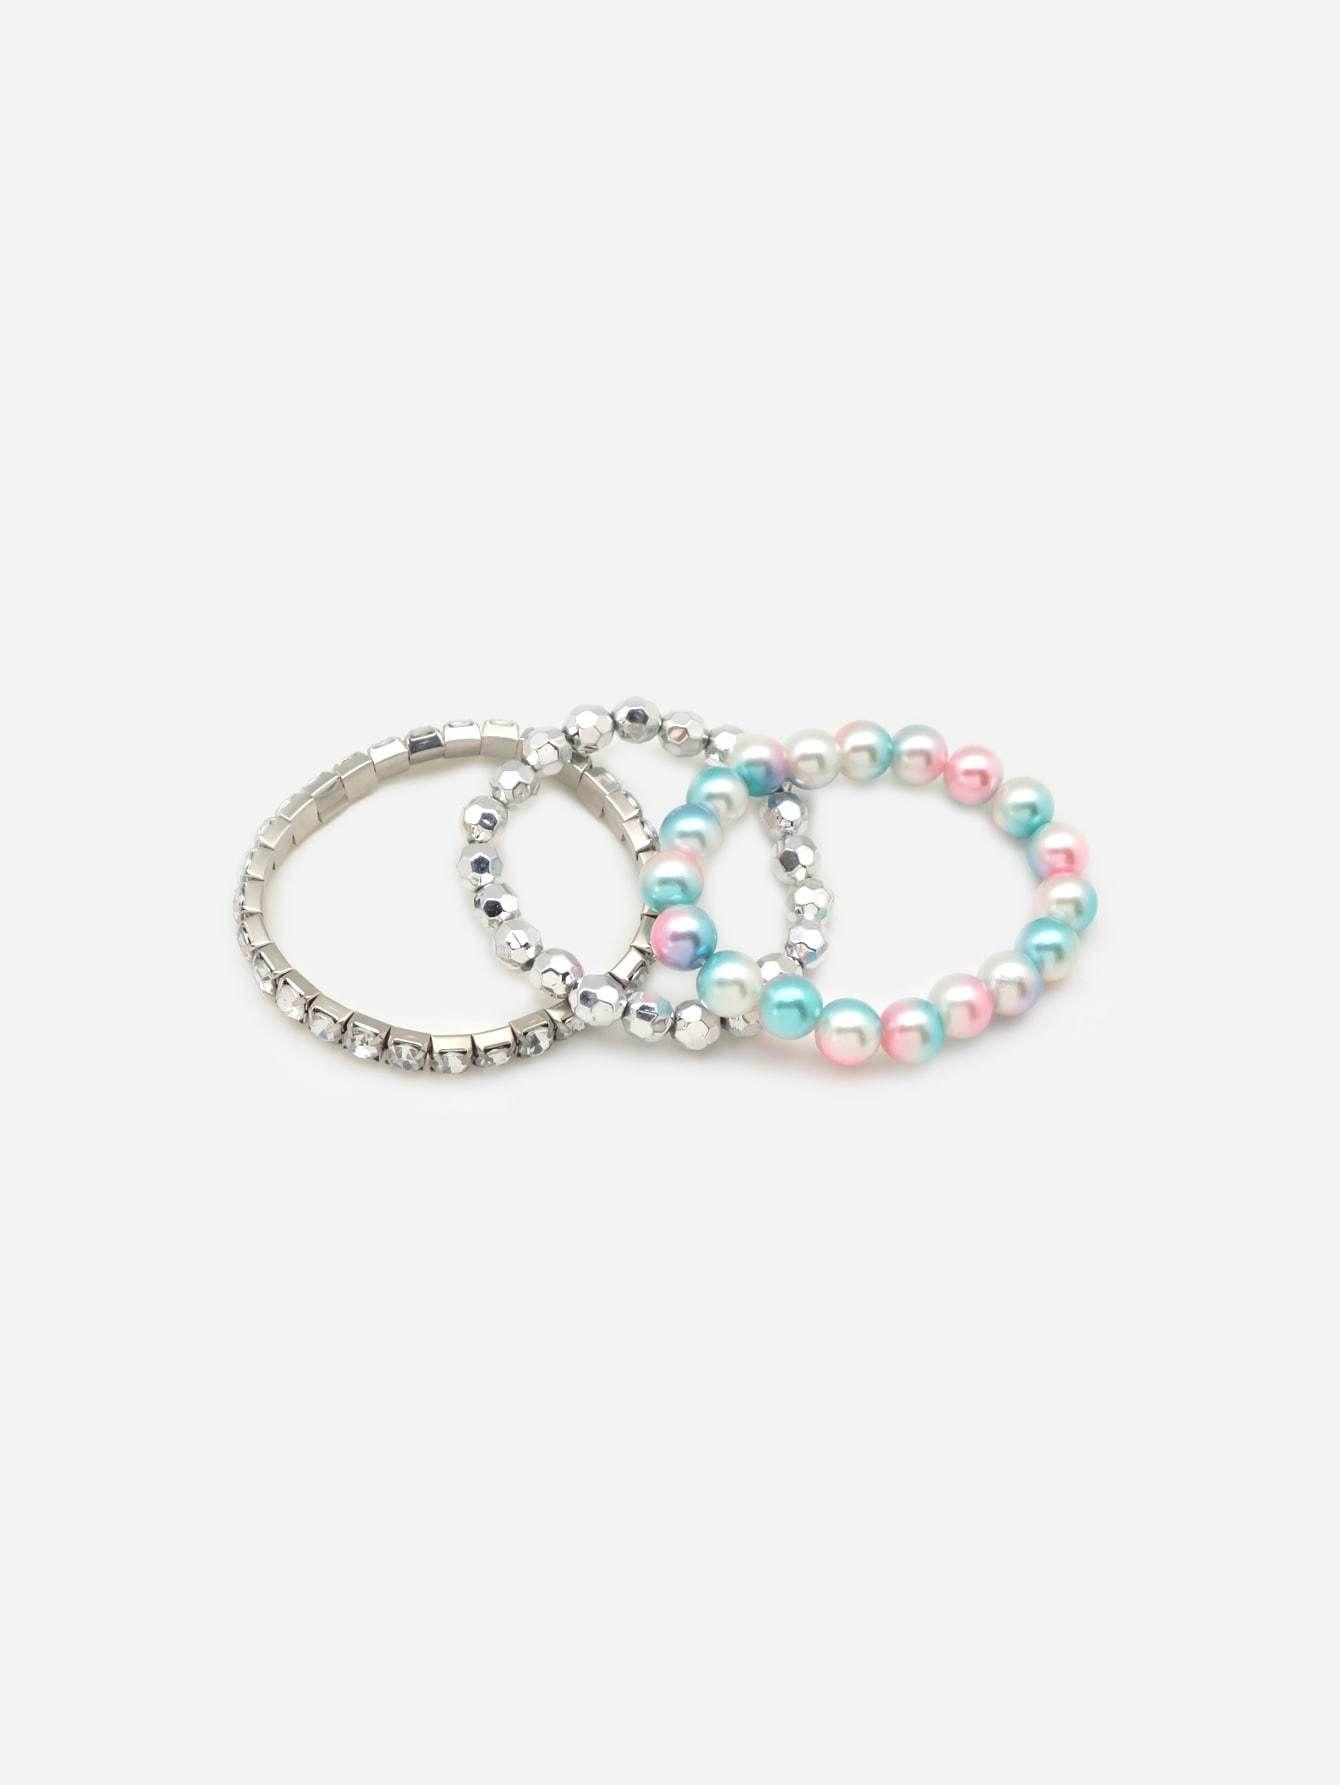 Beaded Bracelet 3pcs In